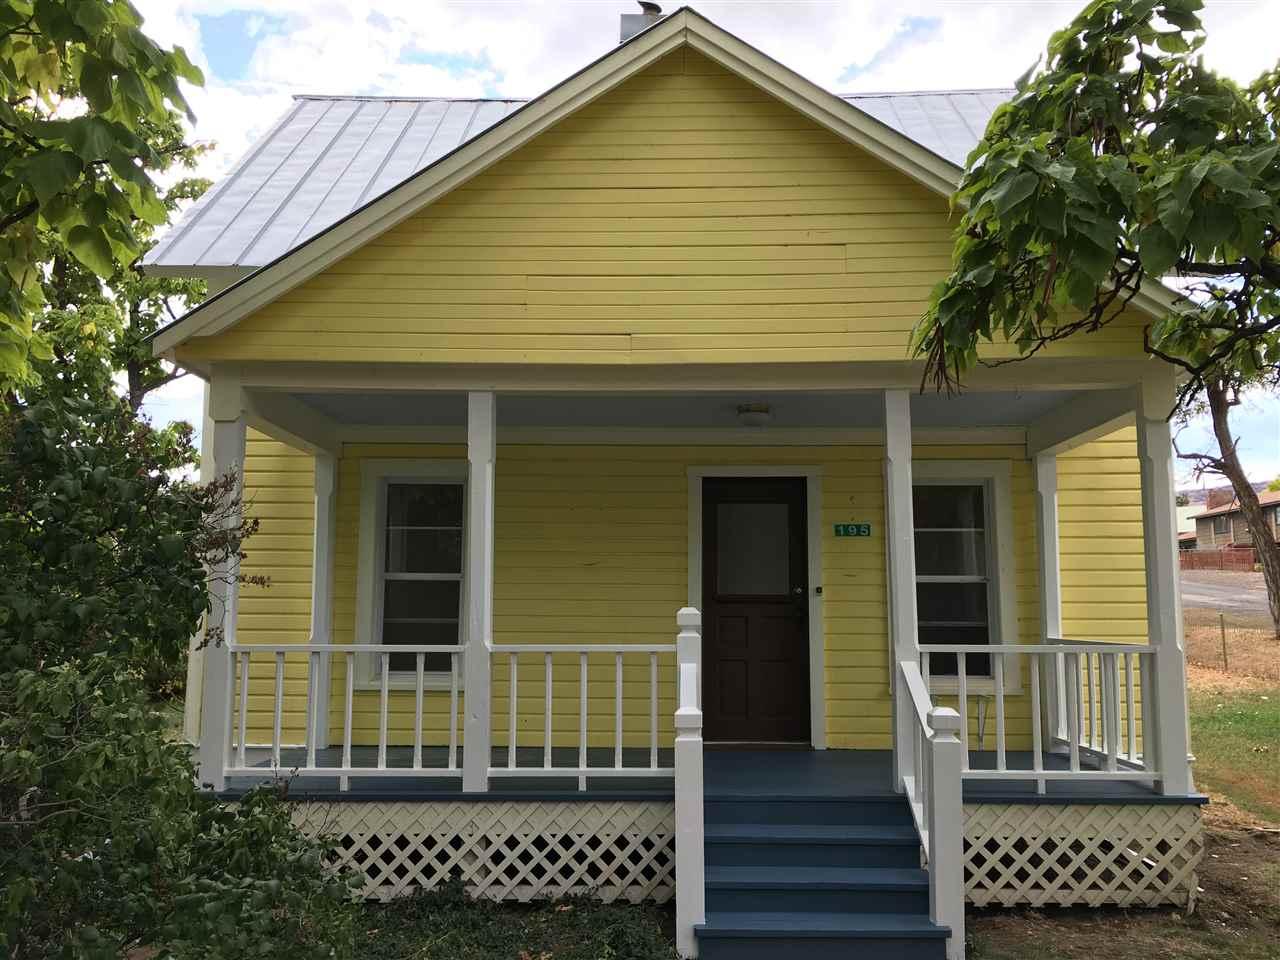 独户住宅 为 销售 在 195 W Central Blvd 195 W Central Blvd Cambridge, 爱达荷州 83610